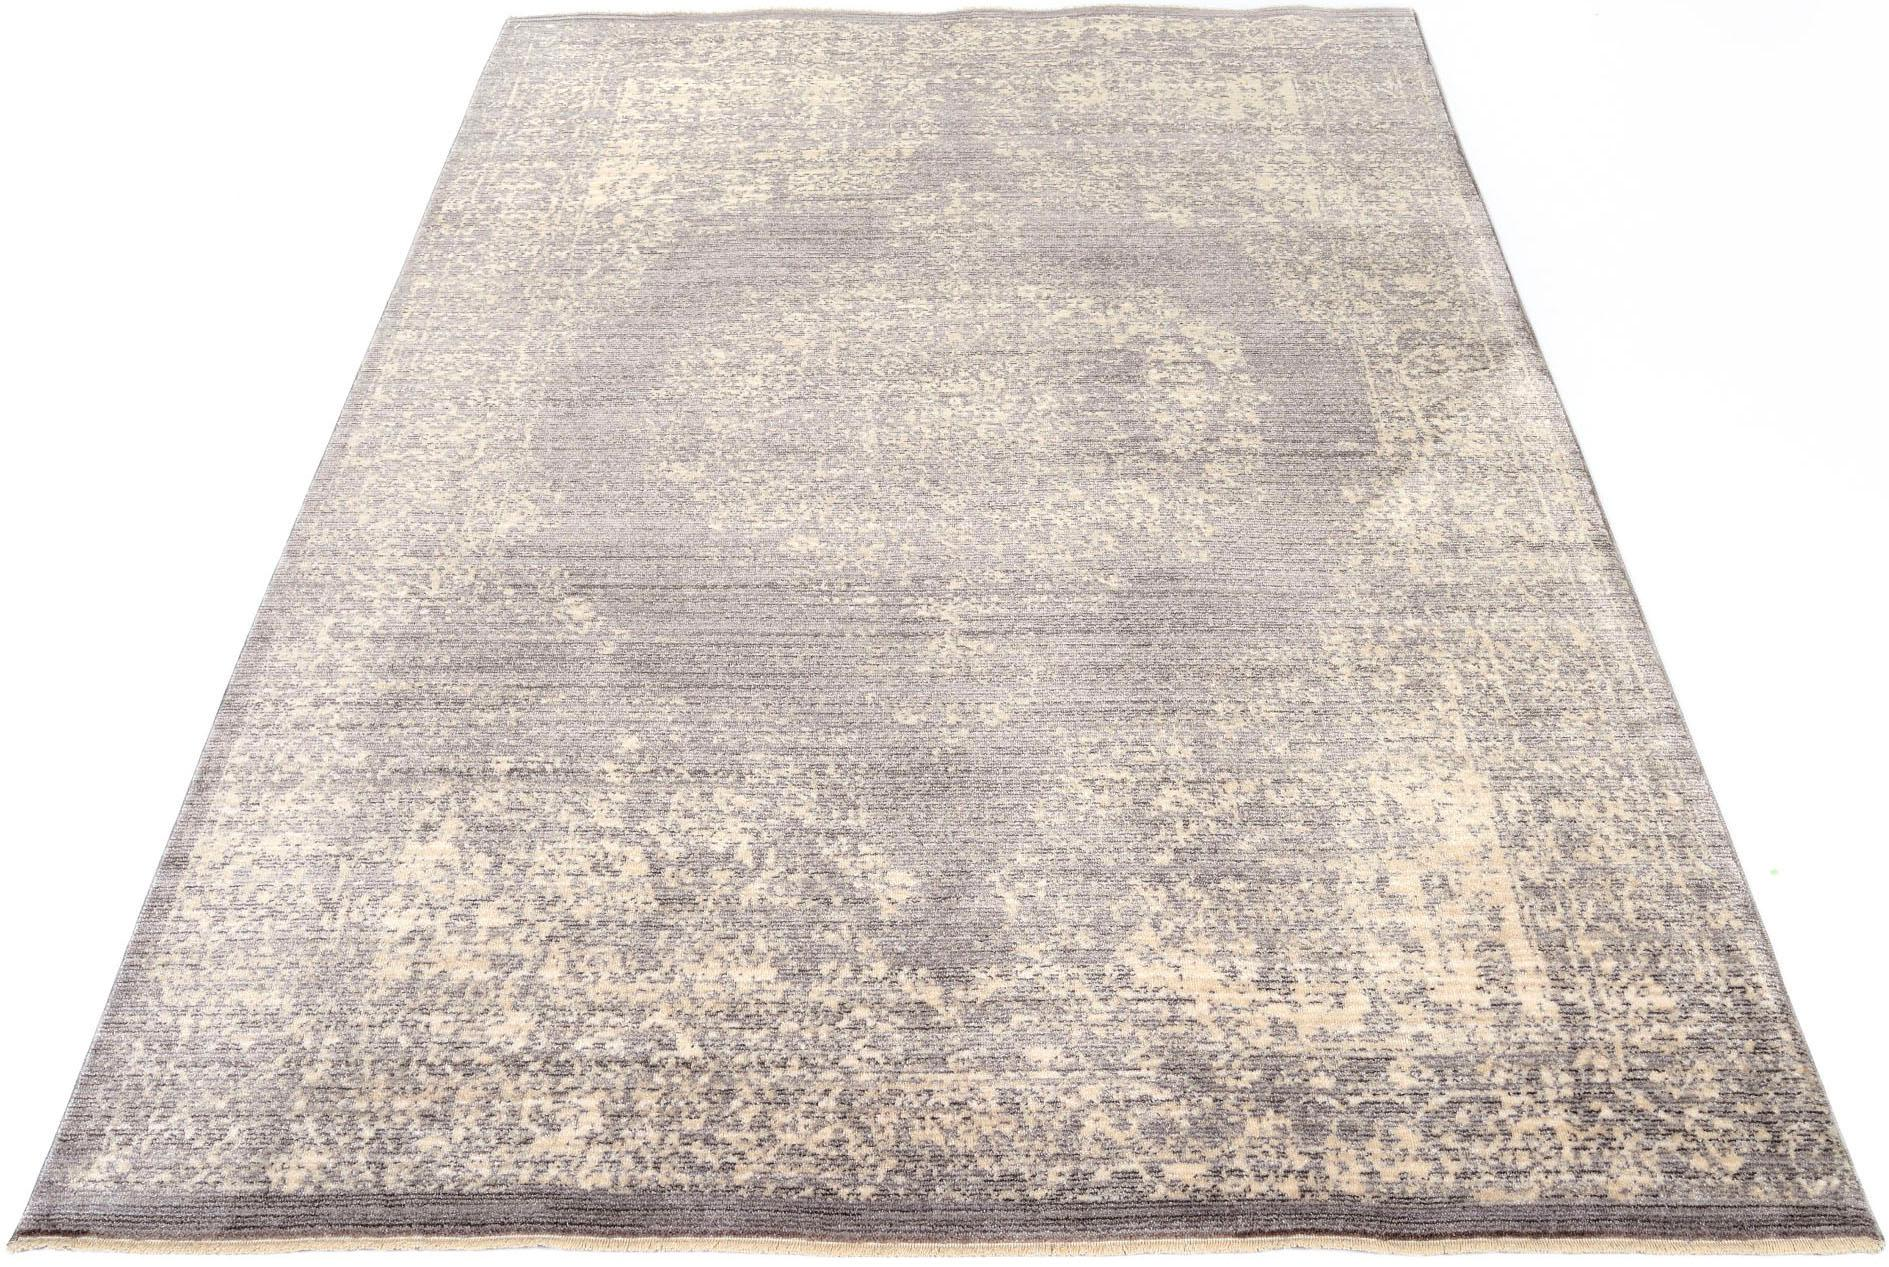 Teppich Bella GALLERY M rechteckig Höhe 8 mm maschinell gewebt